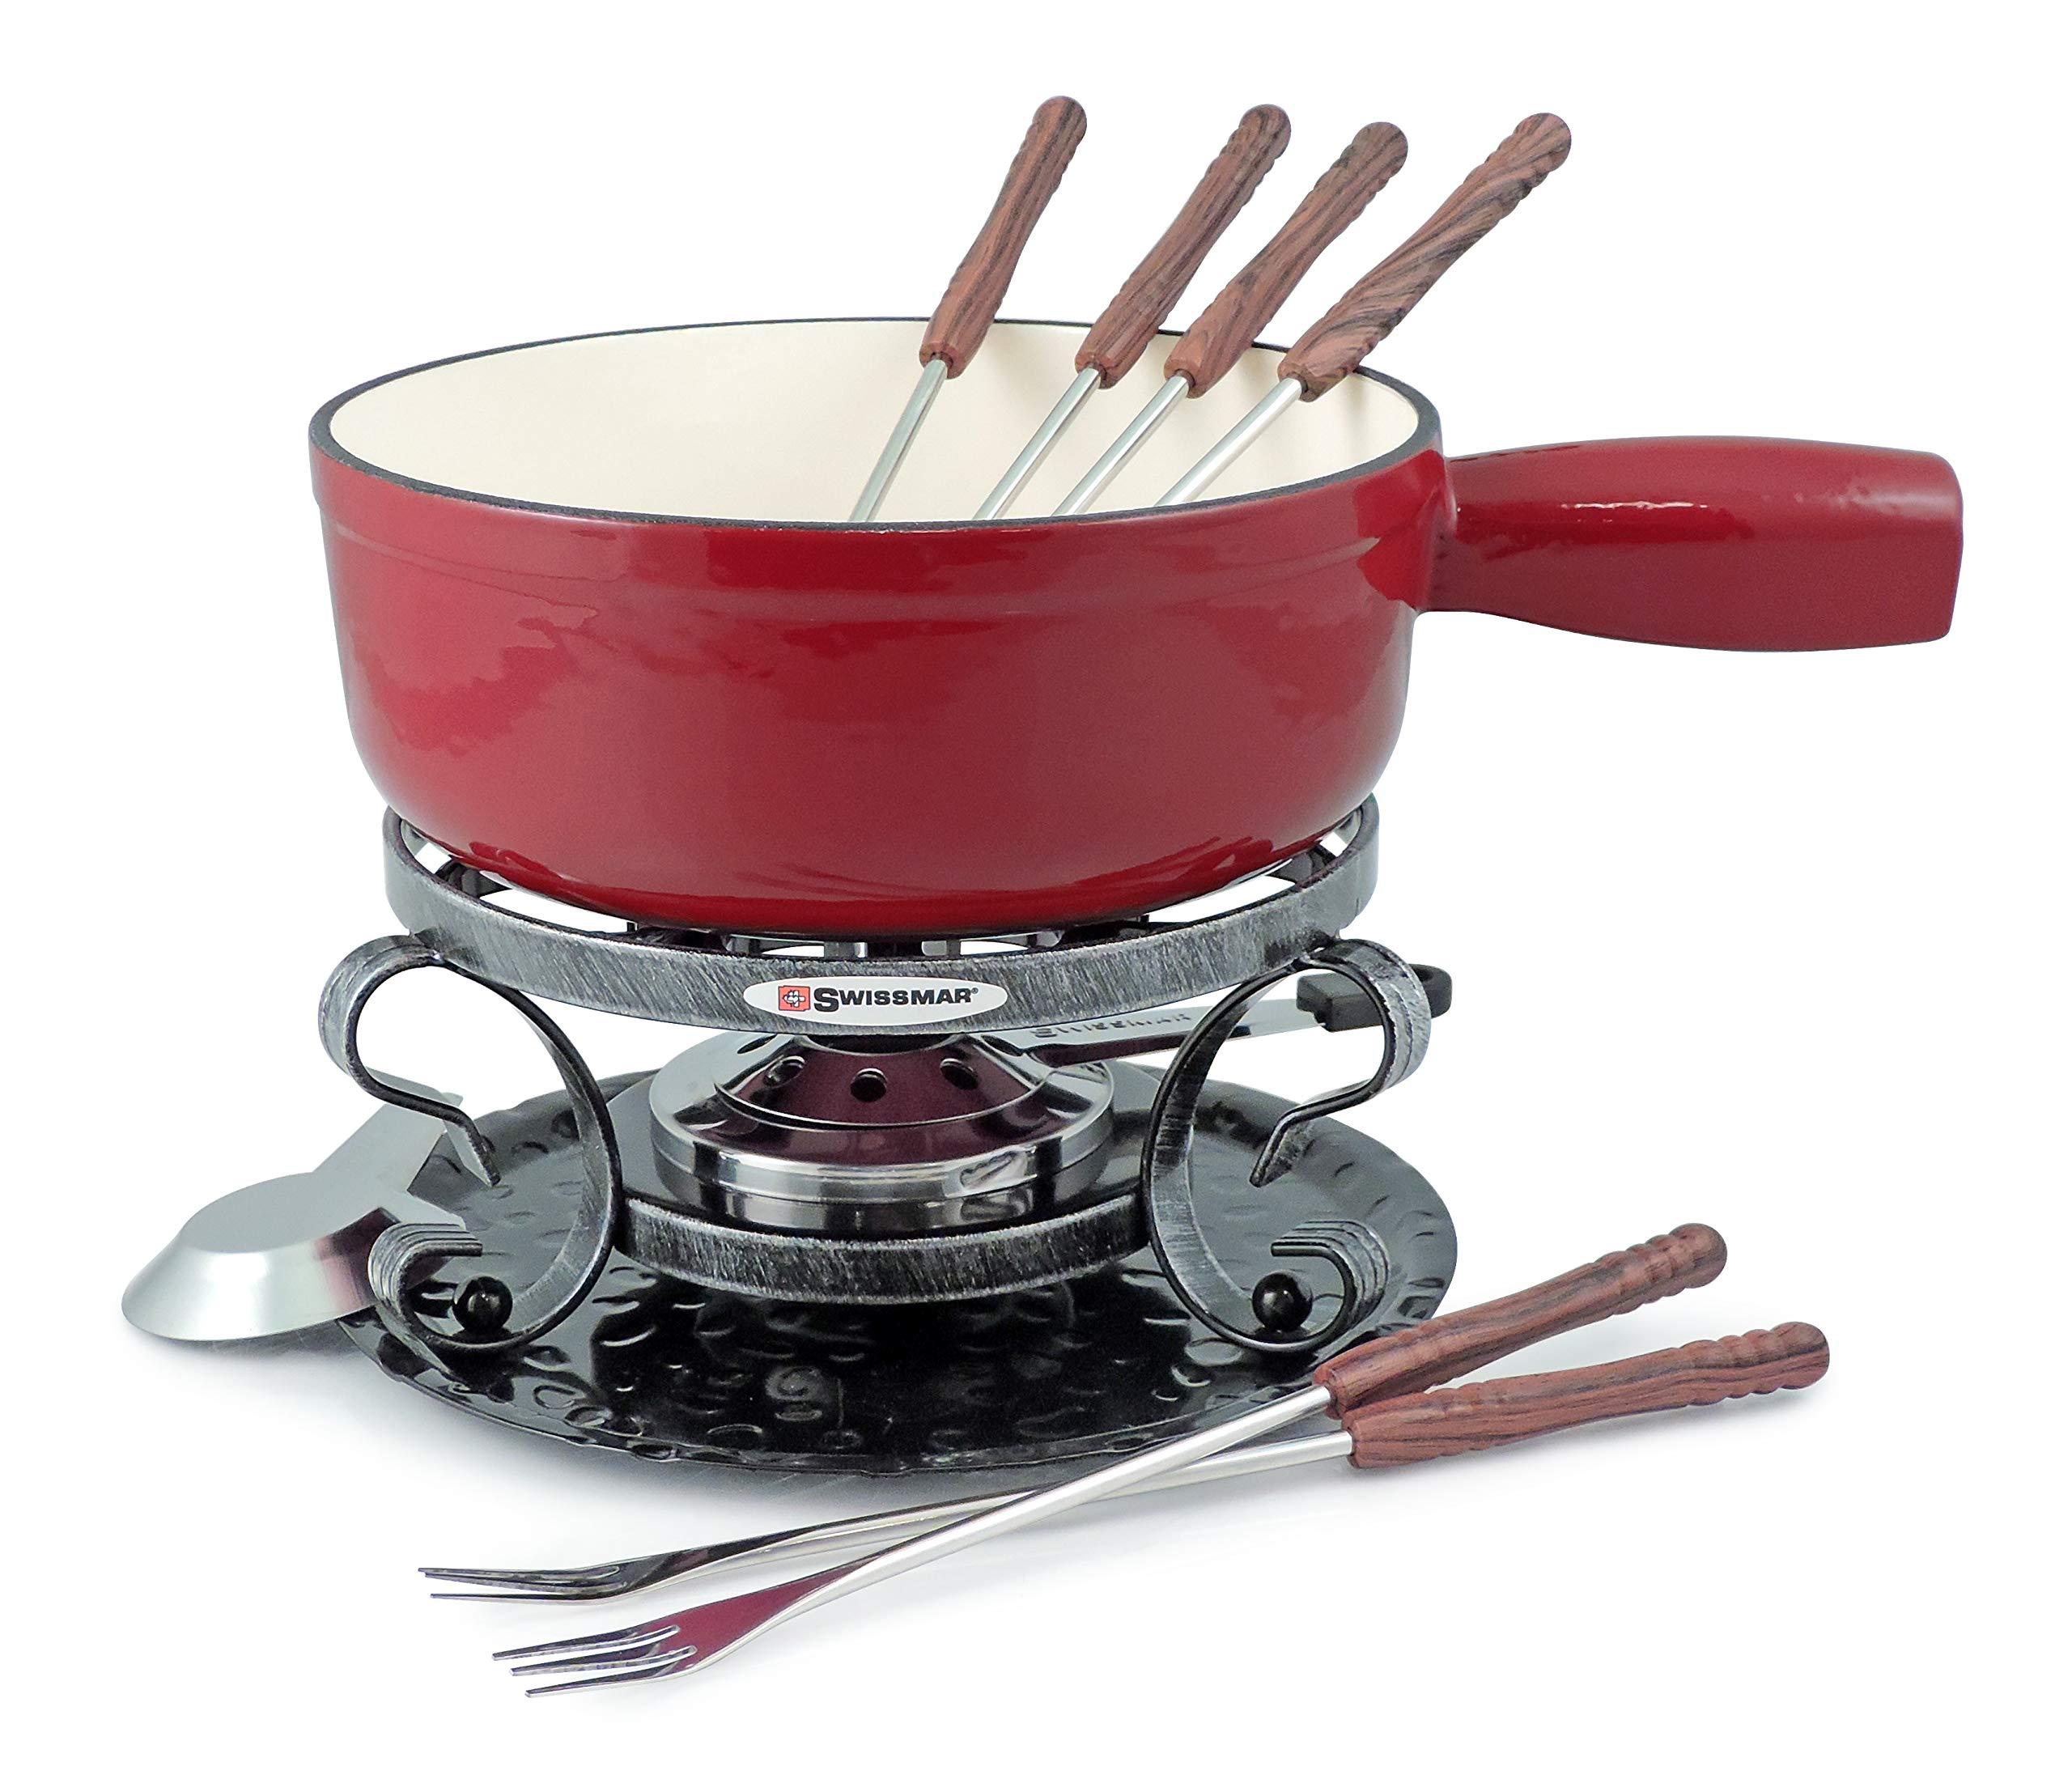 Swissmar KF-66517 Lugano 2-Quart Cast Iron Cheese Fondue Set, 9-Piece, Cherry Red by Swissmar